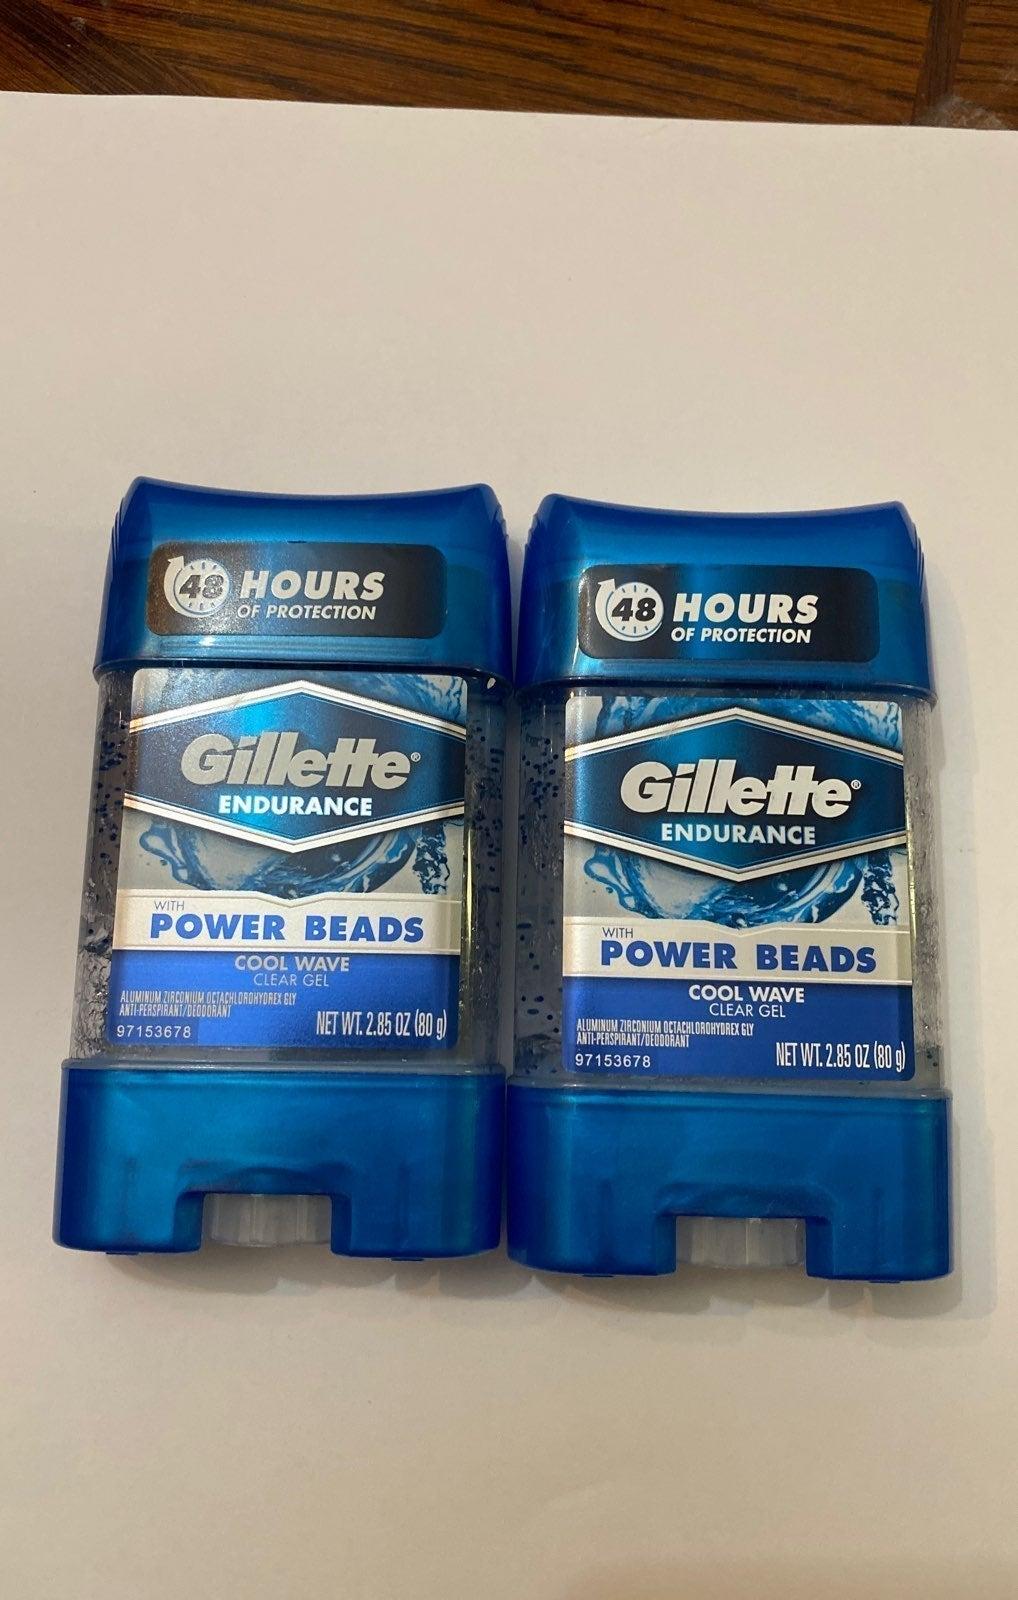 Gillette Endurance Deodorant cool wave